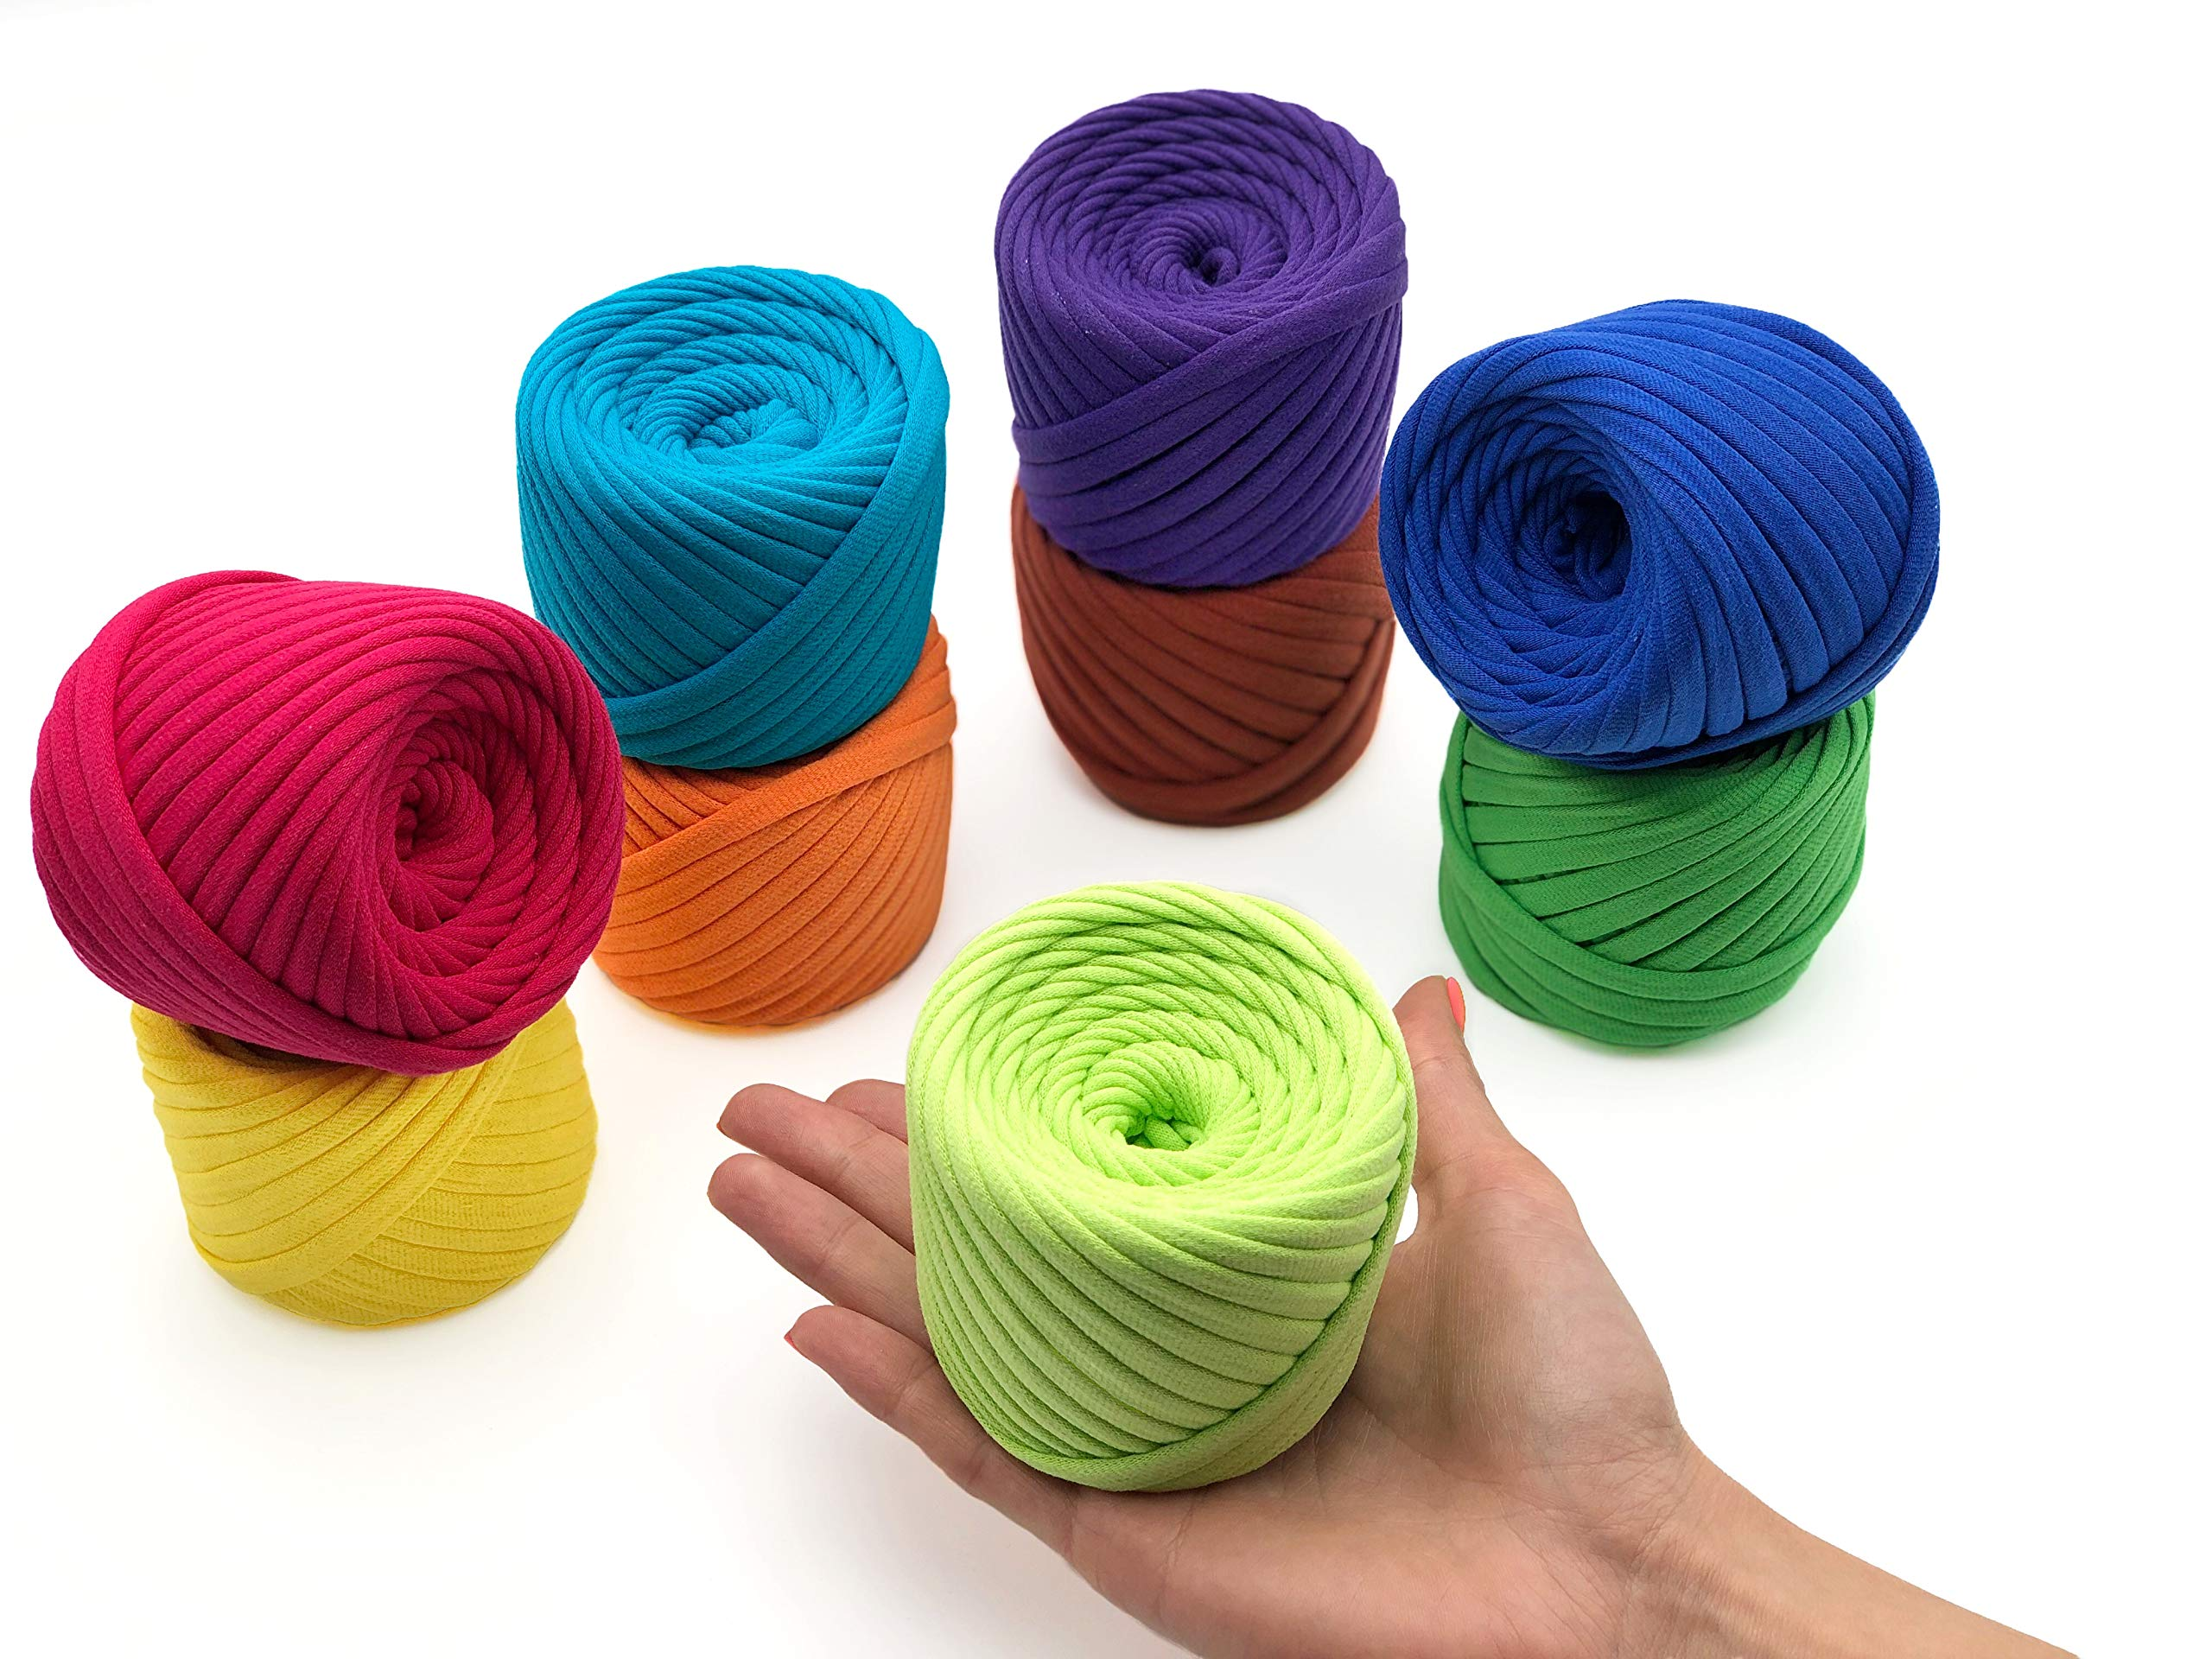 T-Shirt Yarn Fettuccini Zpagetti Set - 9 Balls Total of 196 Yards - Tshirt Yarn Kit for Crocheting - Ribbon Yarn 100% Cotton - Knitting Yarn Ball - T Yarn Organic - T-Yarn Duval Set